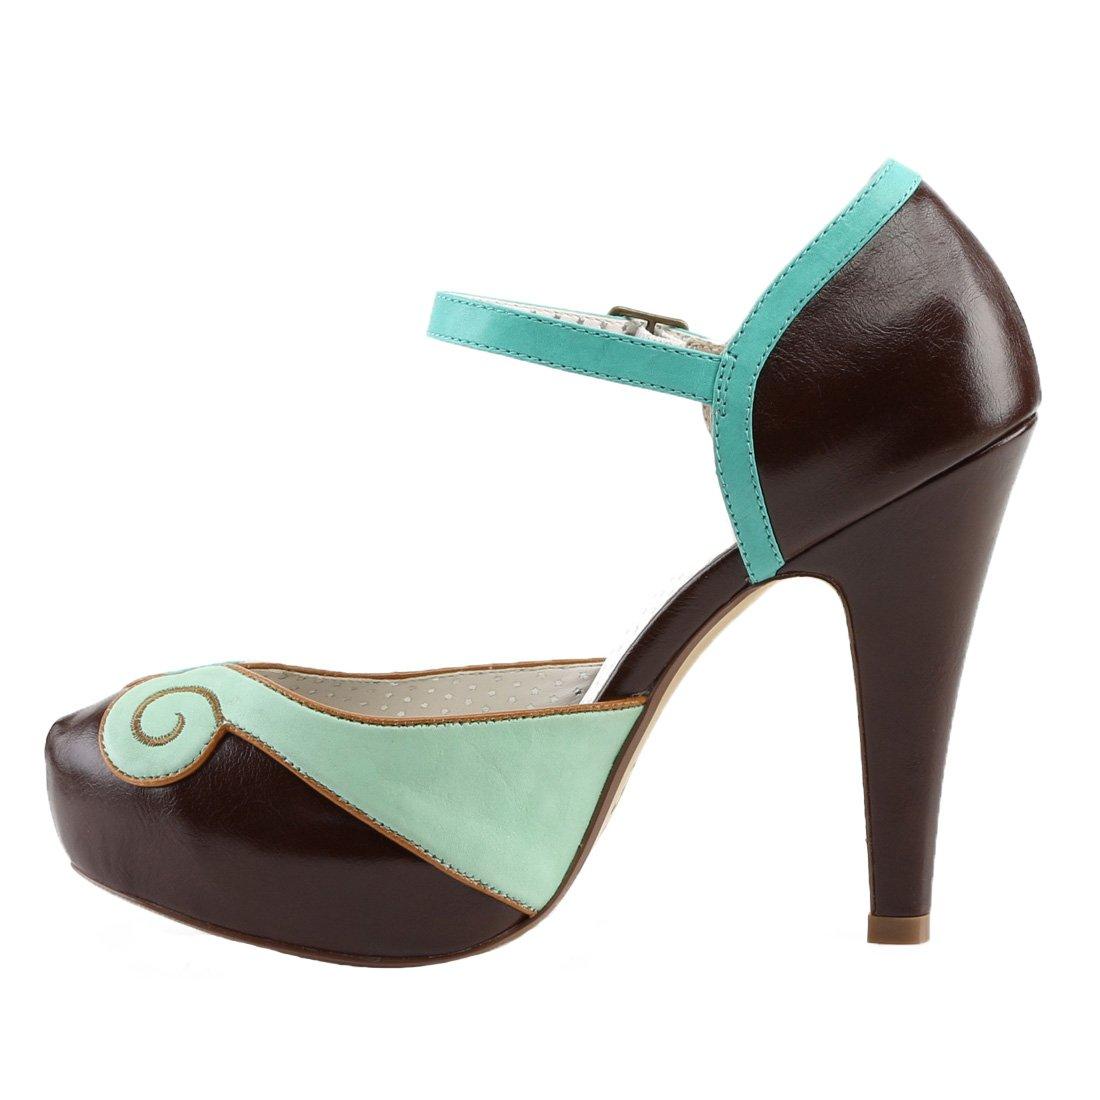 Pin up Couture BETTIE-17 Teal-Braun Leder Faux Leder Teal-Braun f128e4